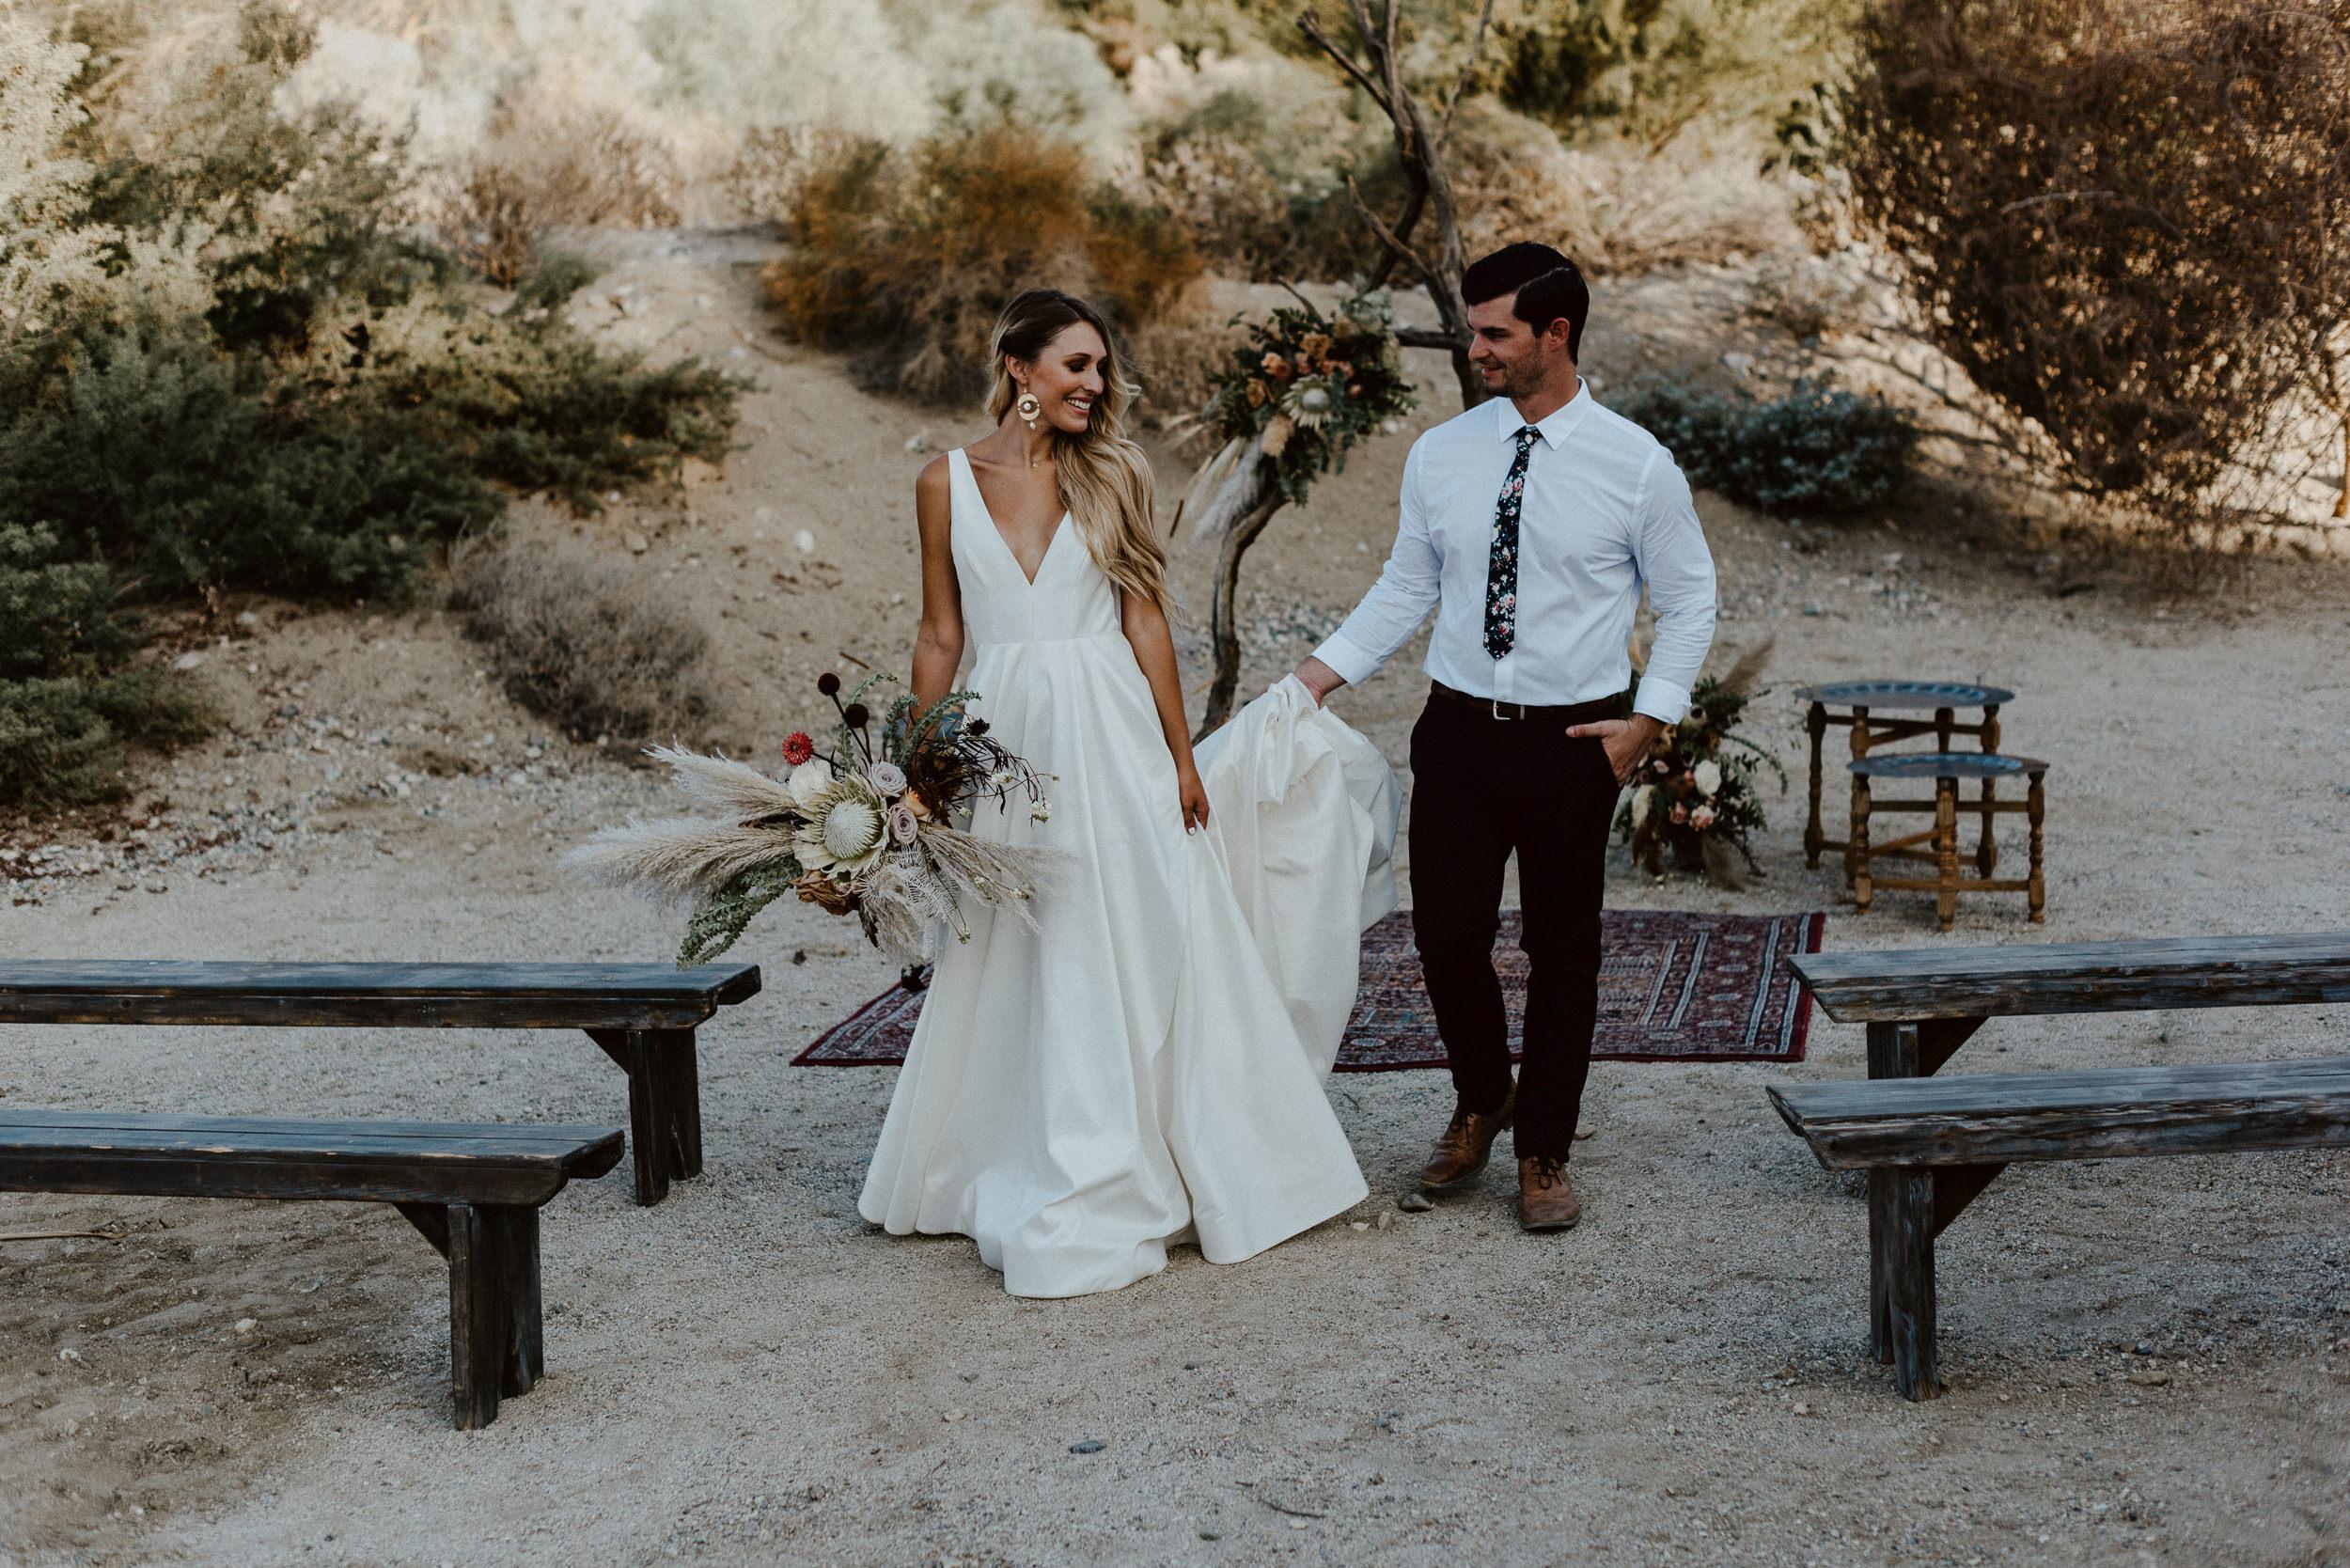 sChelsie + Chris - The Desert Shootout Wedding Romantics at The Living Desert-69.jpg